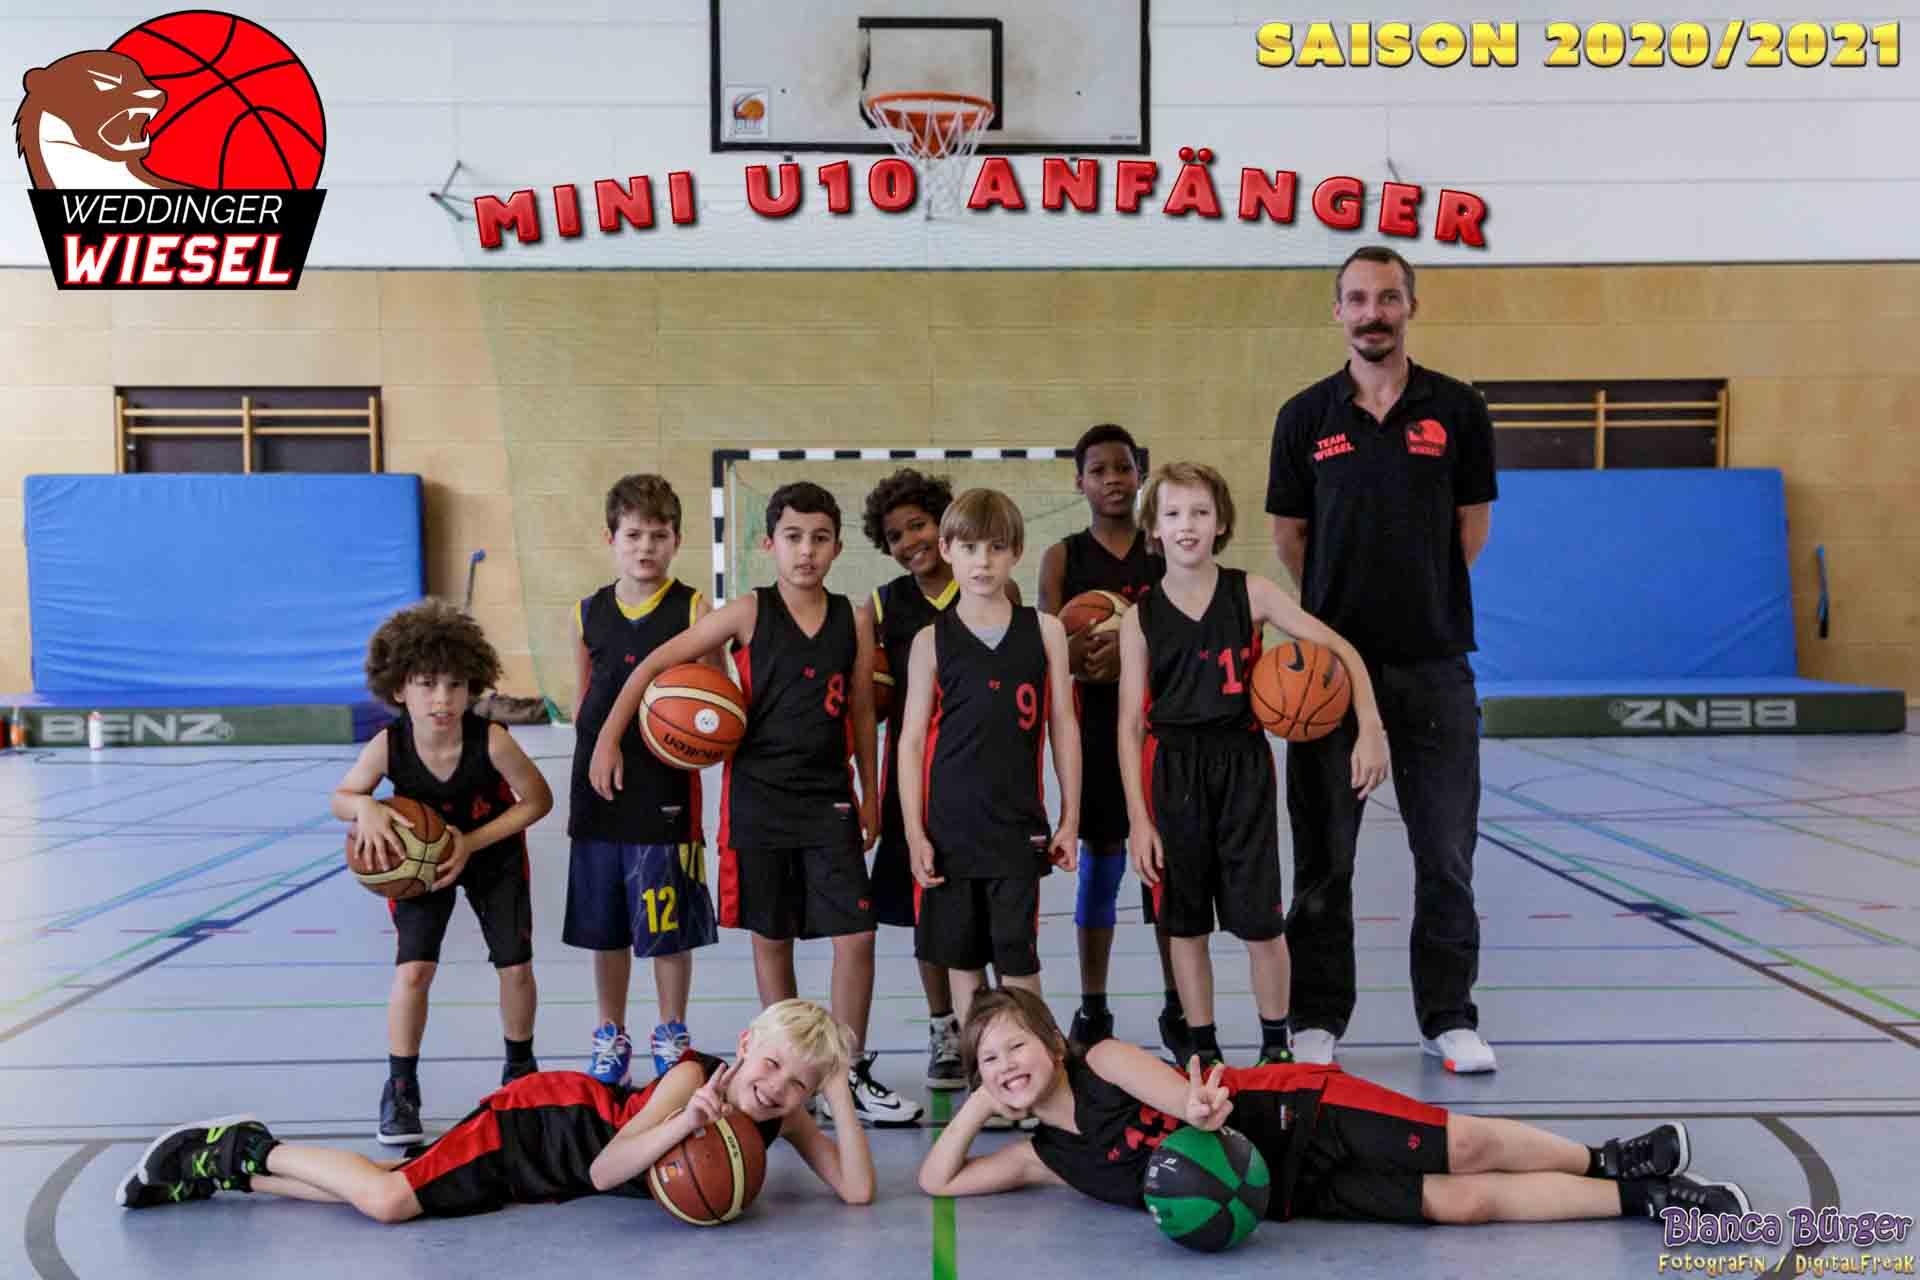 Team Mini U10 A Weddinger Wiesel Saison 2020-2021